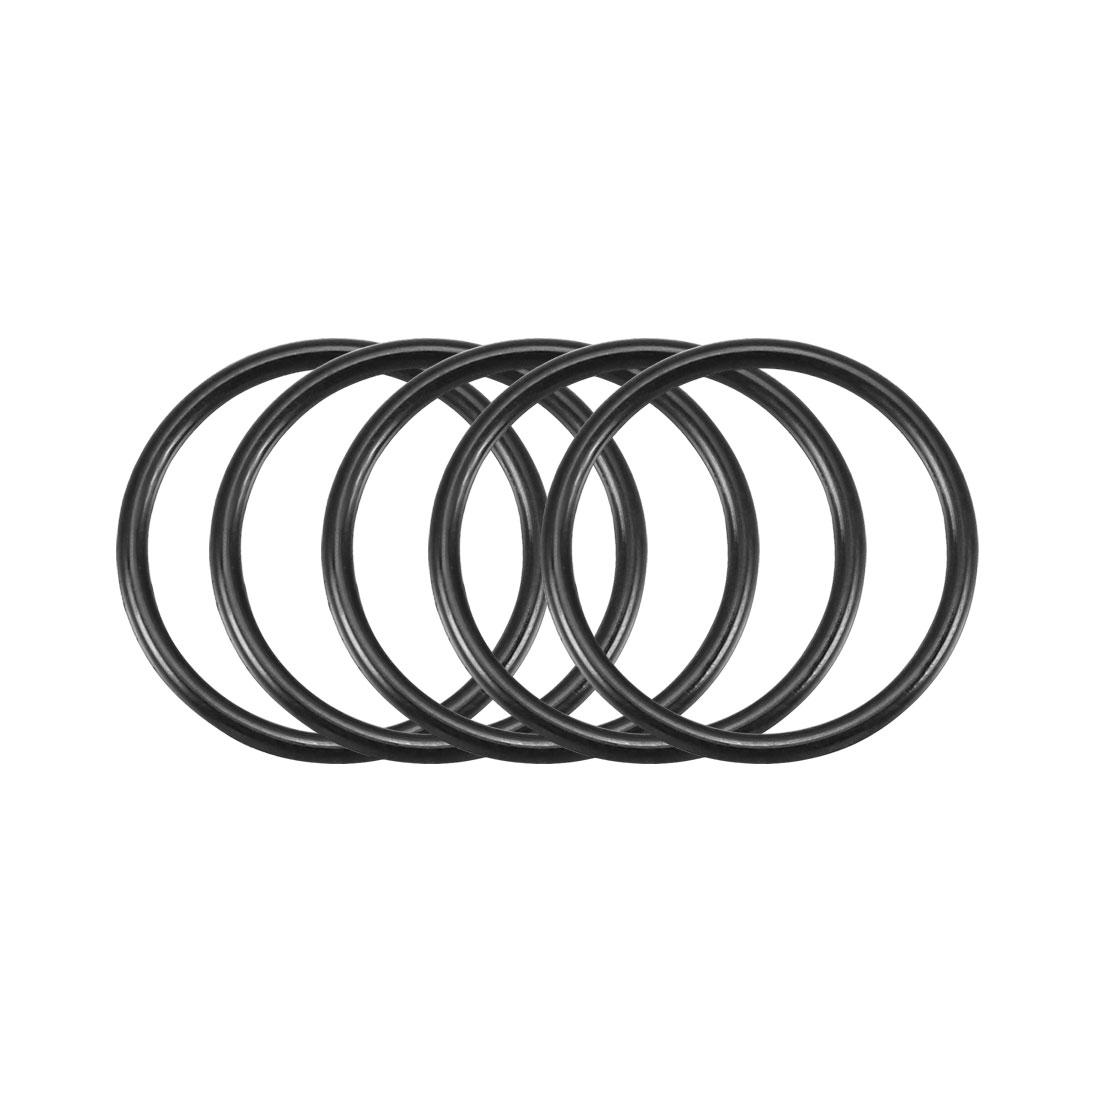 50Pcs Black 20mm x 1.5mm Nitrile Rubber O Ring NBR Oil Sealing Grommets